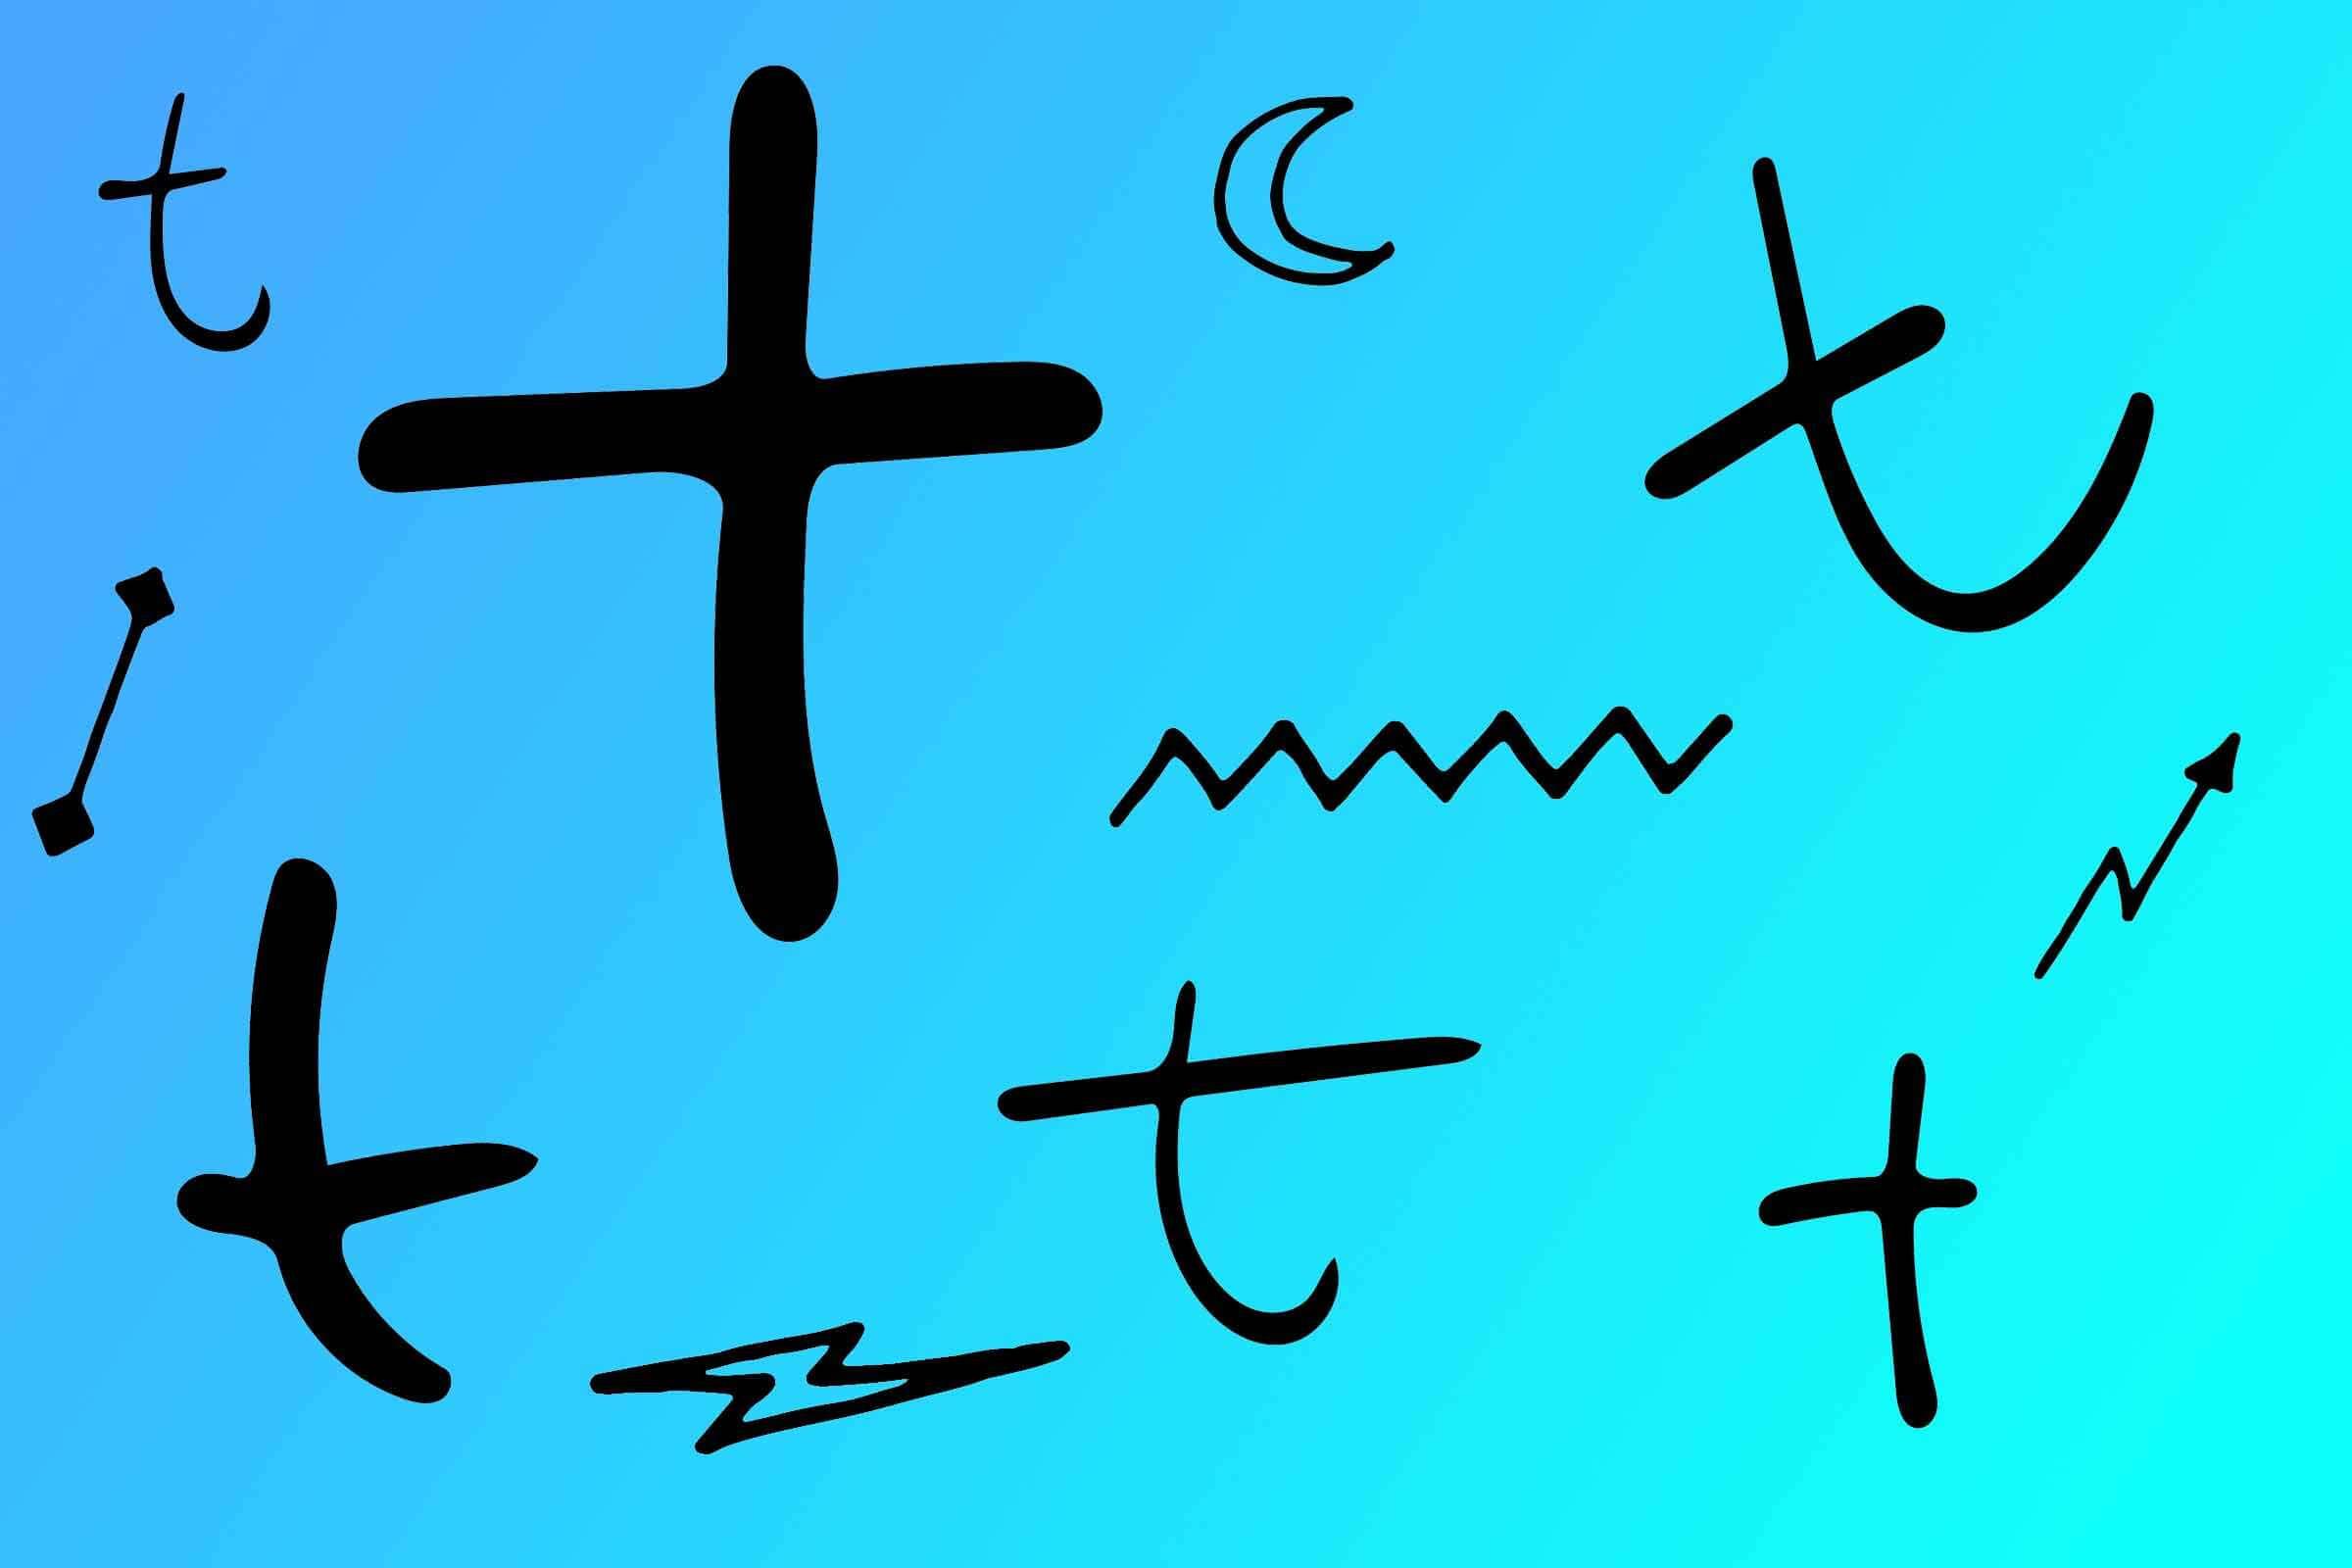 nhin-chu-doan-tinh-cach-huong-di-moi-giup-sep-doc-vi-nhan-vien-7